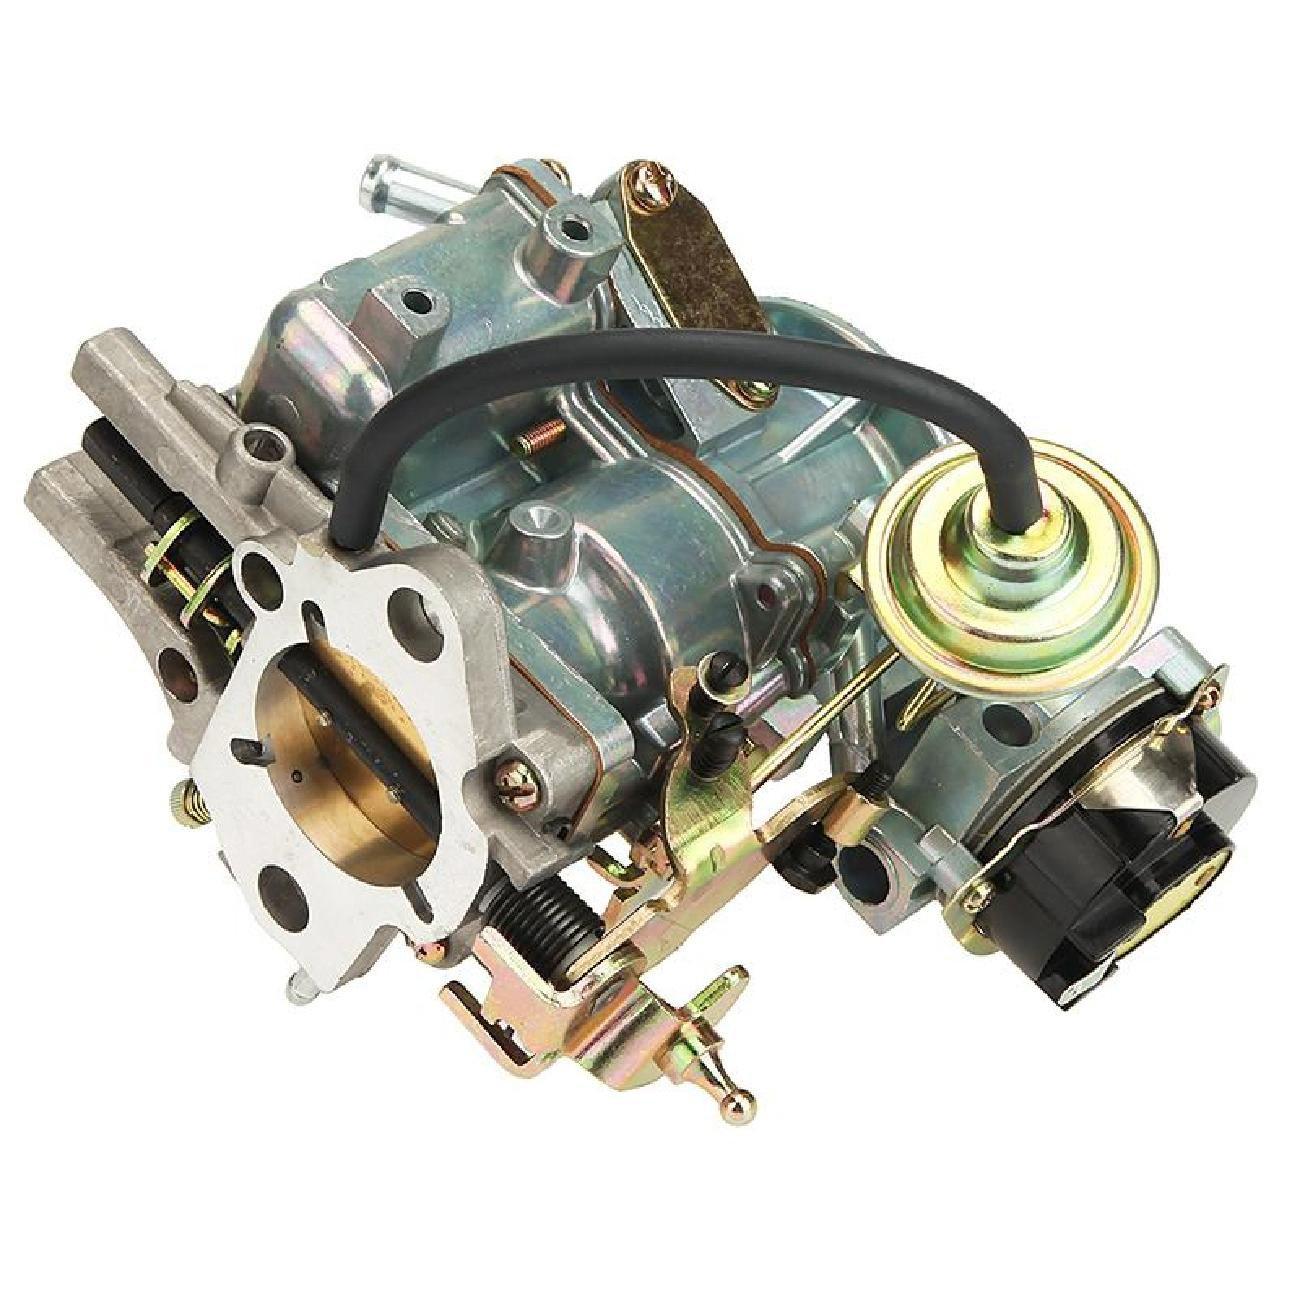 Carburetor Type Carter F300 YFA 1-barrel Electric Choke For Ford 4.9L 300 cu I6